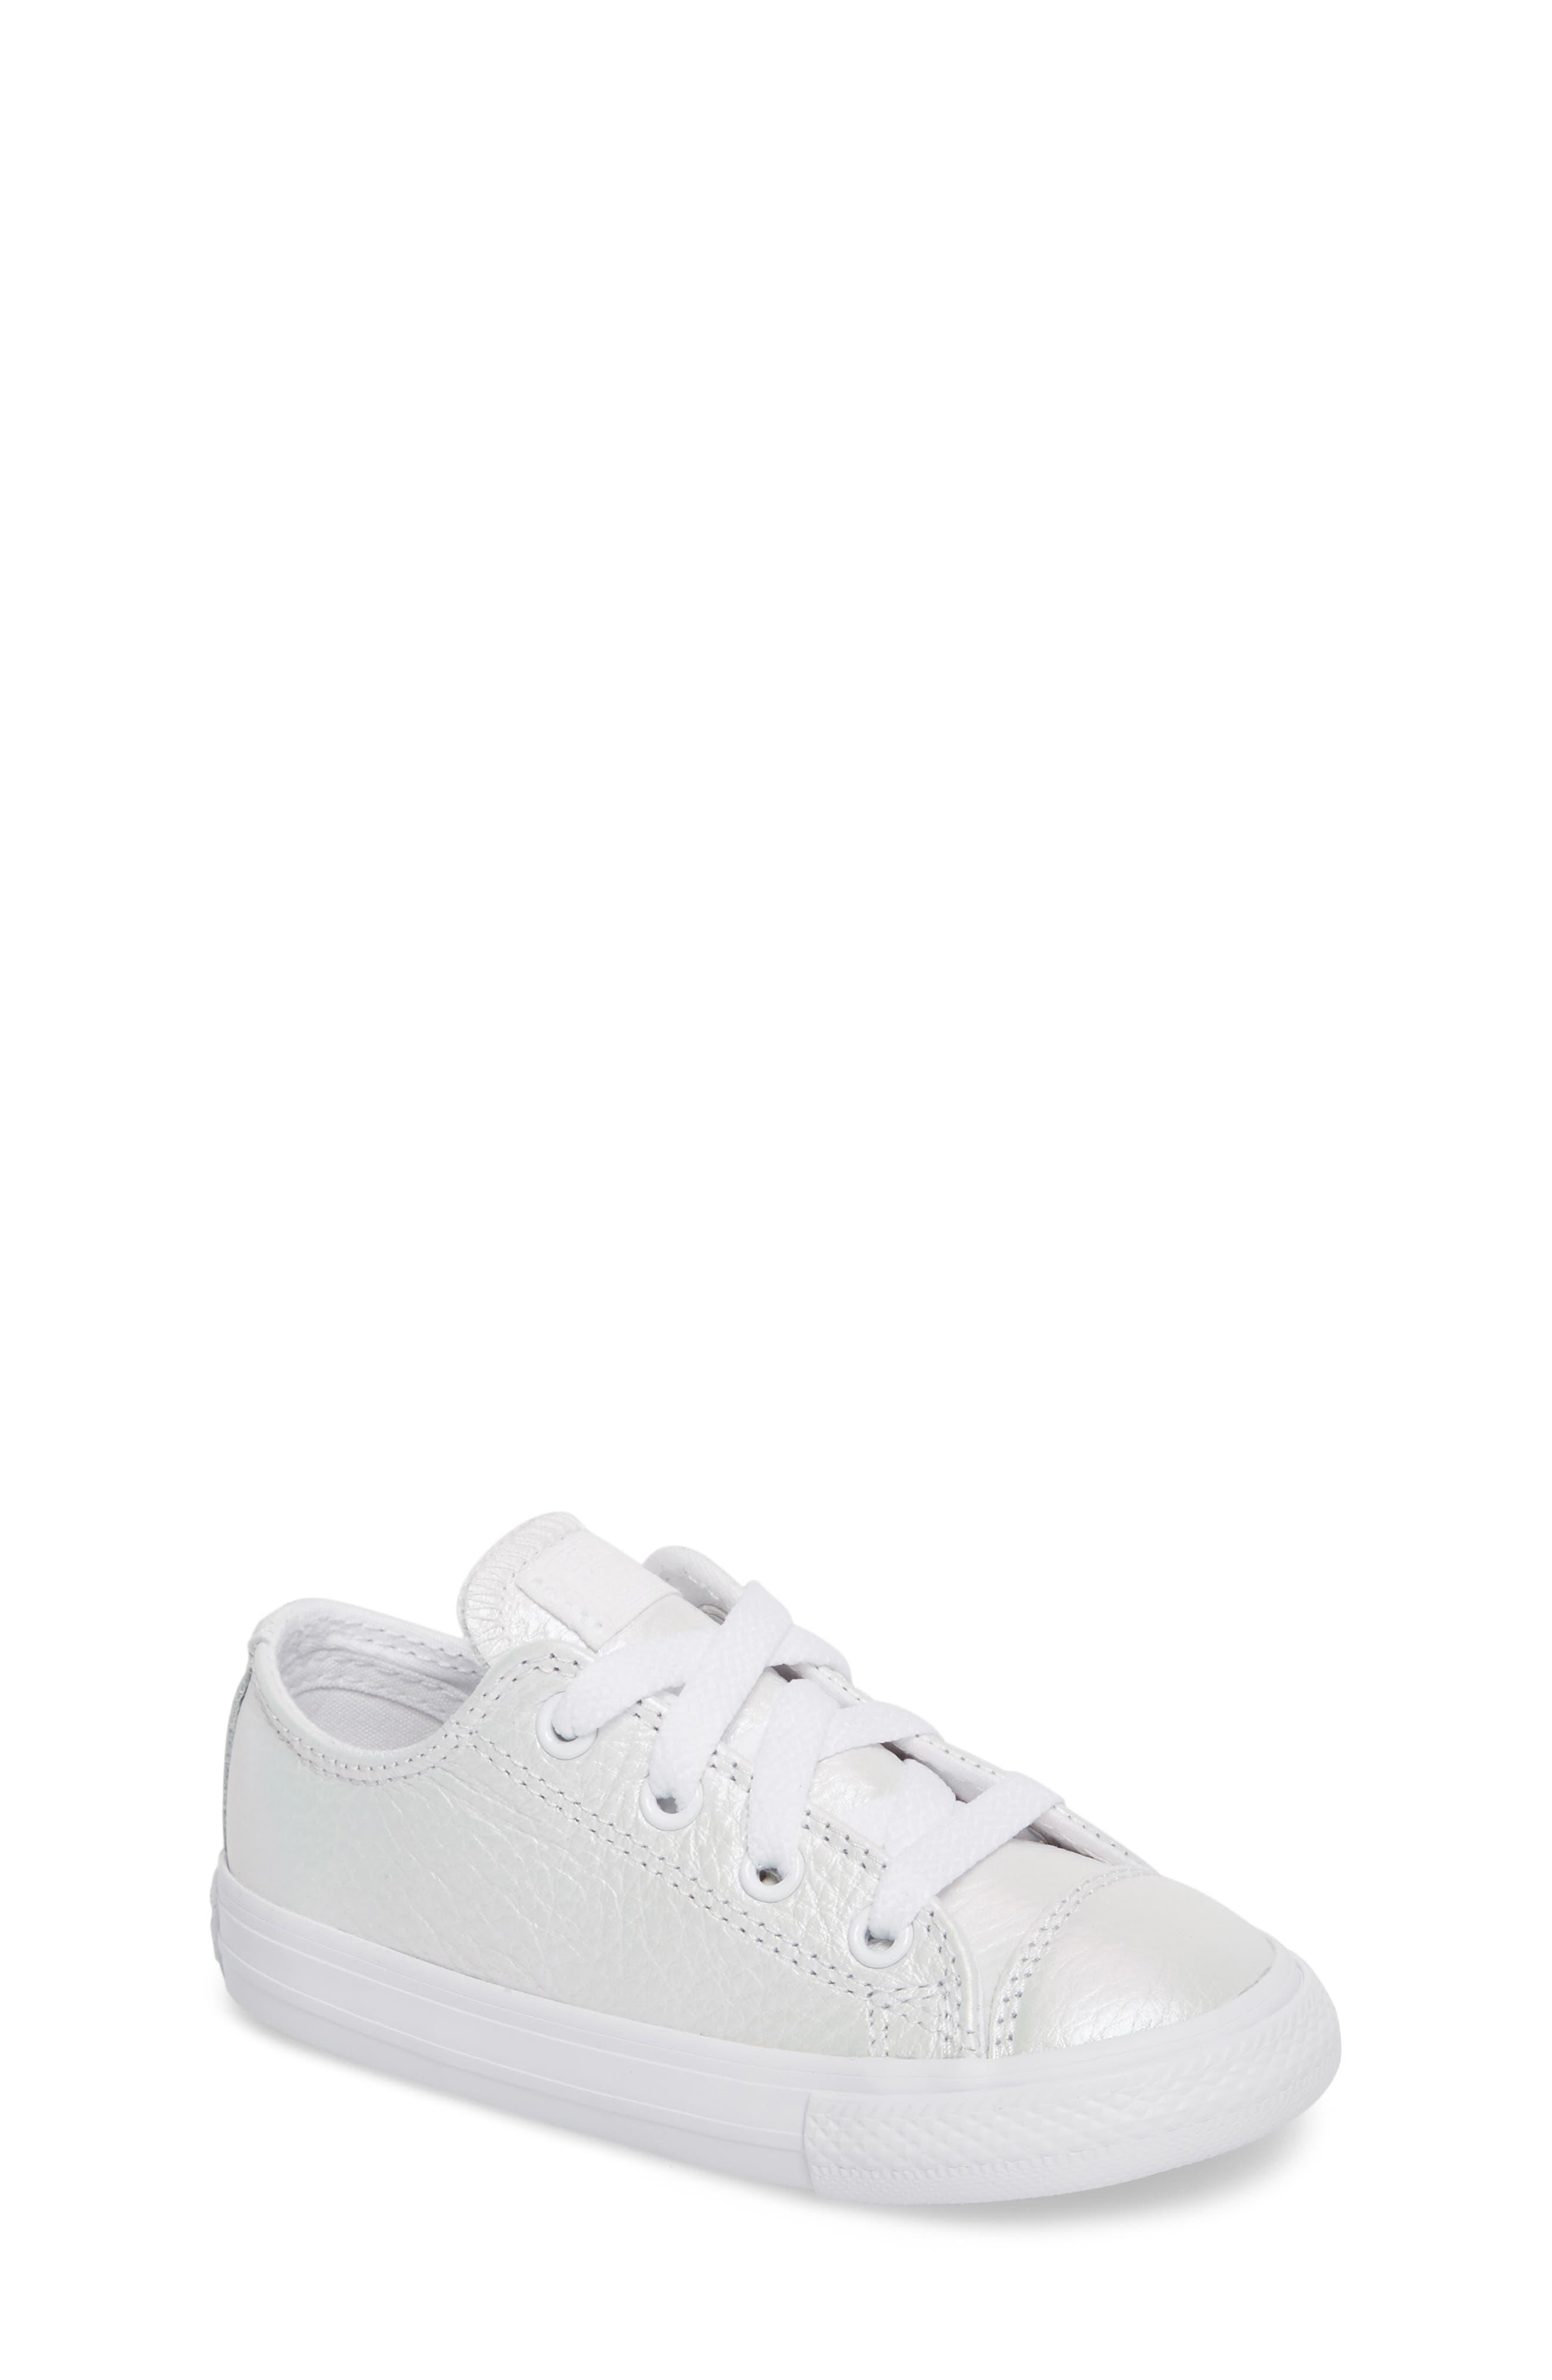 Main Image - Converse Chuck Taylor® All Star® Iridescent Sneaker (Baby, Walker, Toddler & Little Kid)